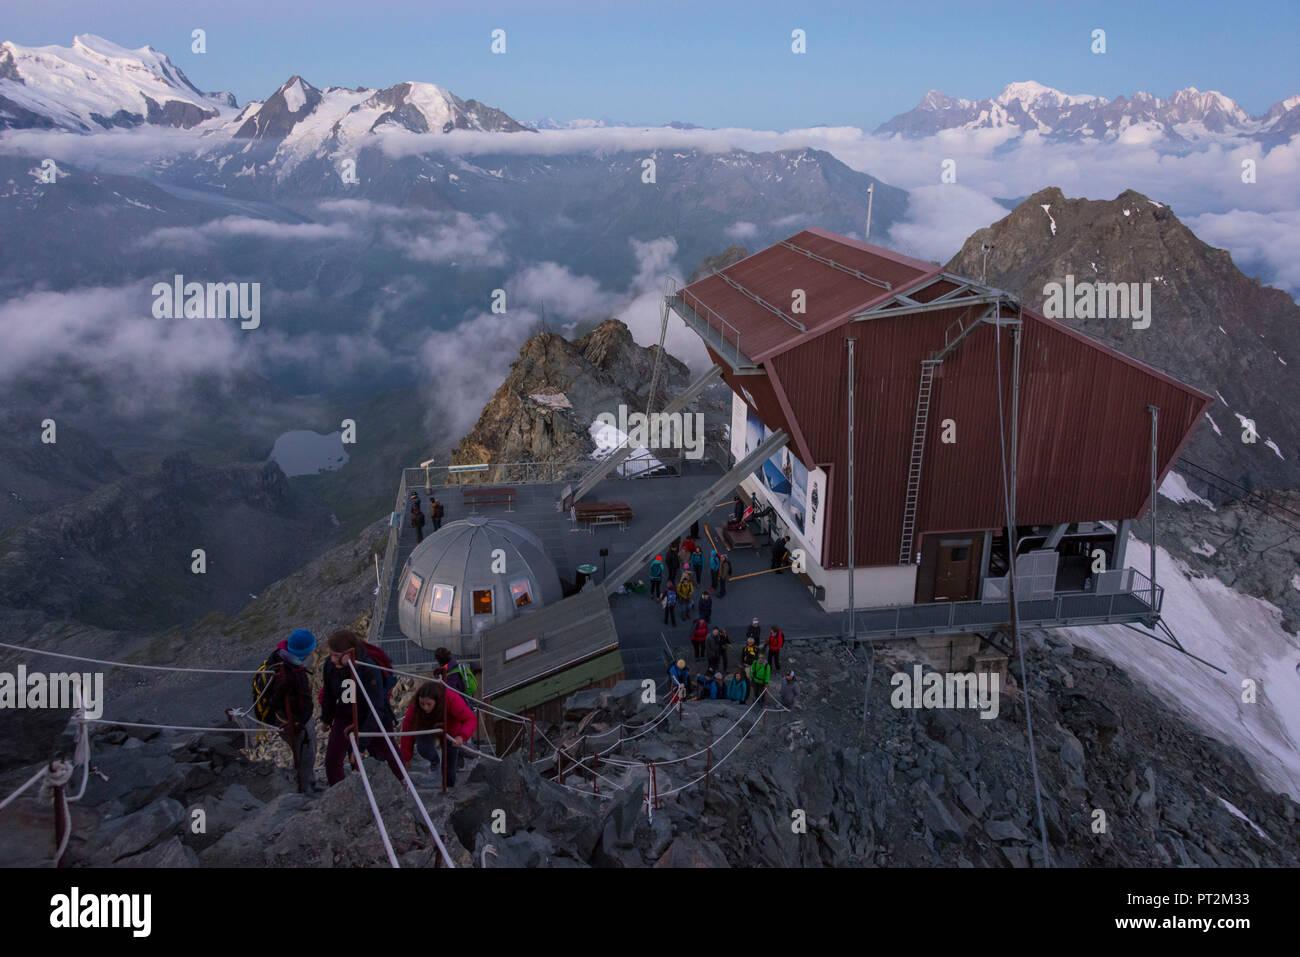 Switzerland, canton Valais, district Entremont, Verbier, sunrise, 3329 m high Mont-Fort, view on the Combin de Corbassière, people enjoying the view - Stock Image